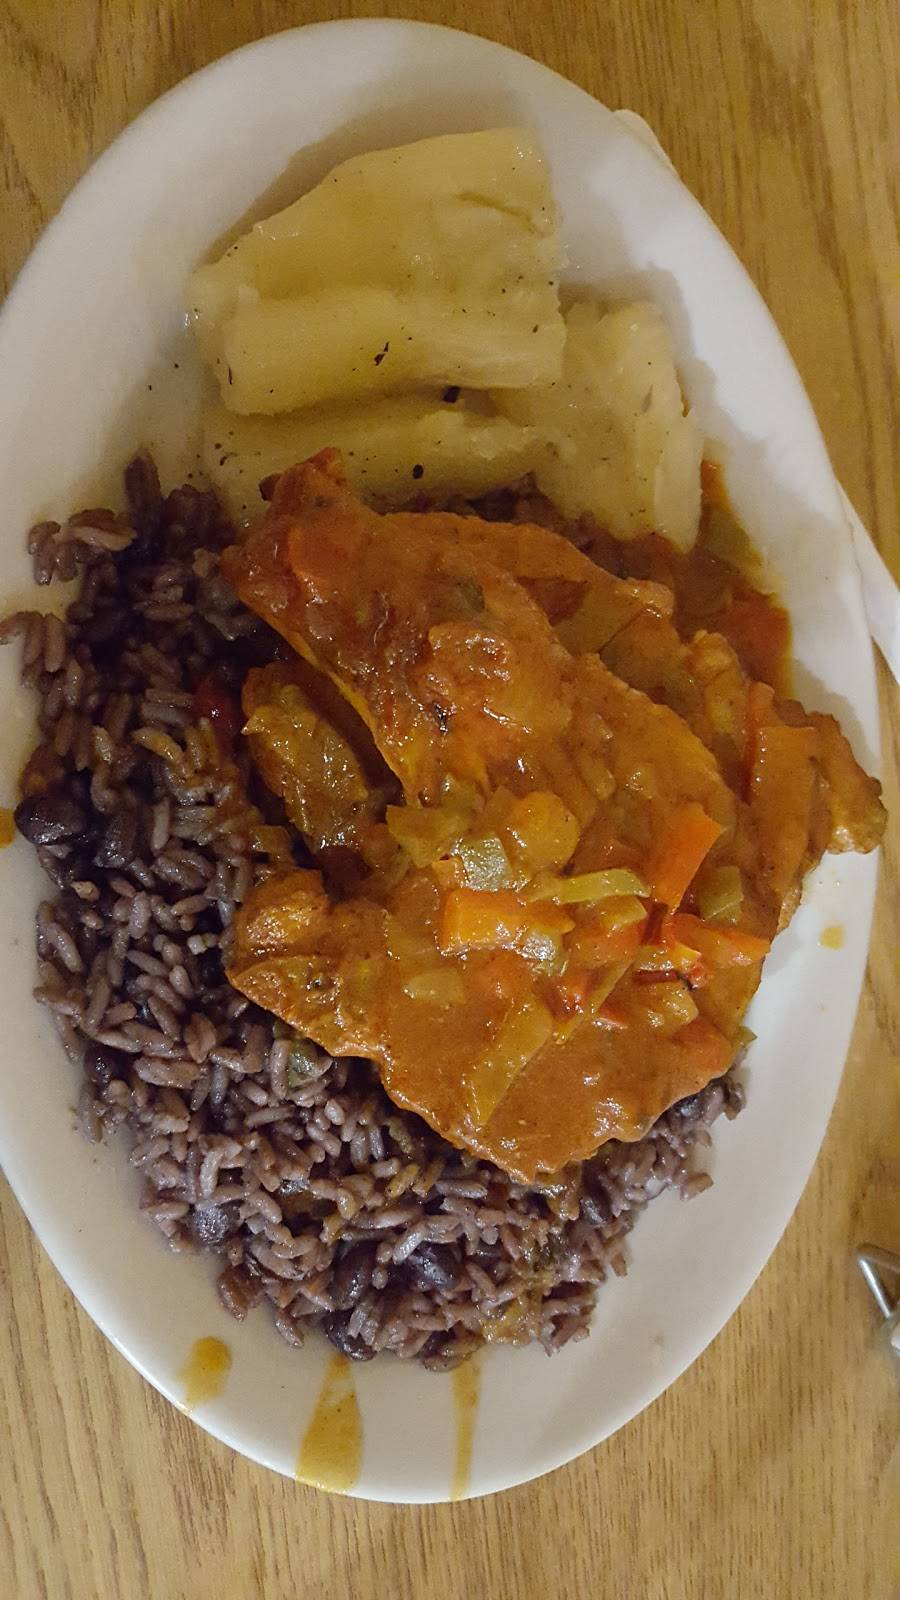 Sophies Cuban Cuisine | restaurant | 73 New St, New York, NY 10004, USA | 2128097755 OR +1 212-809-7755